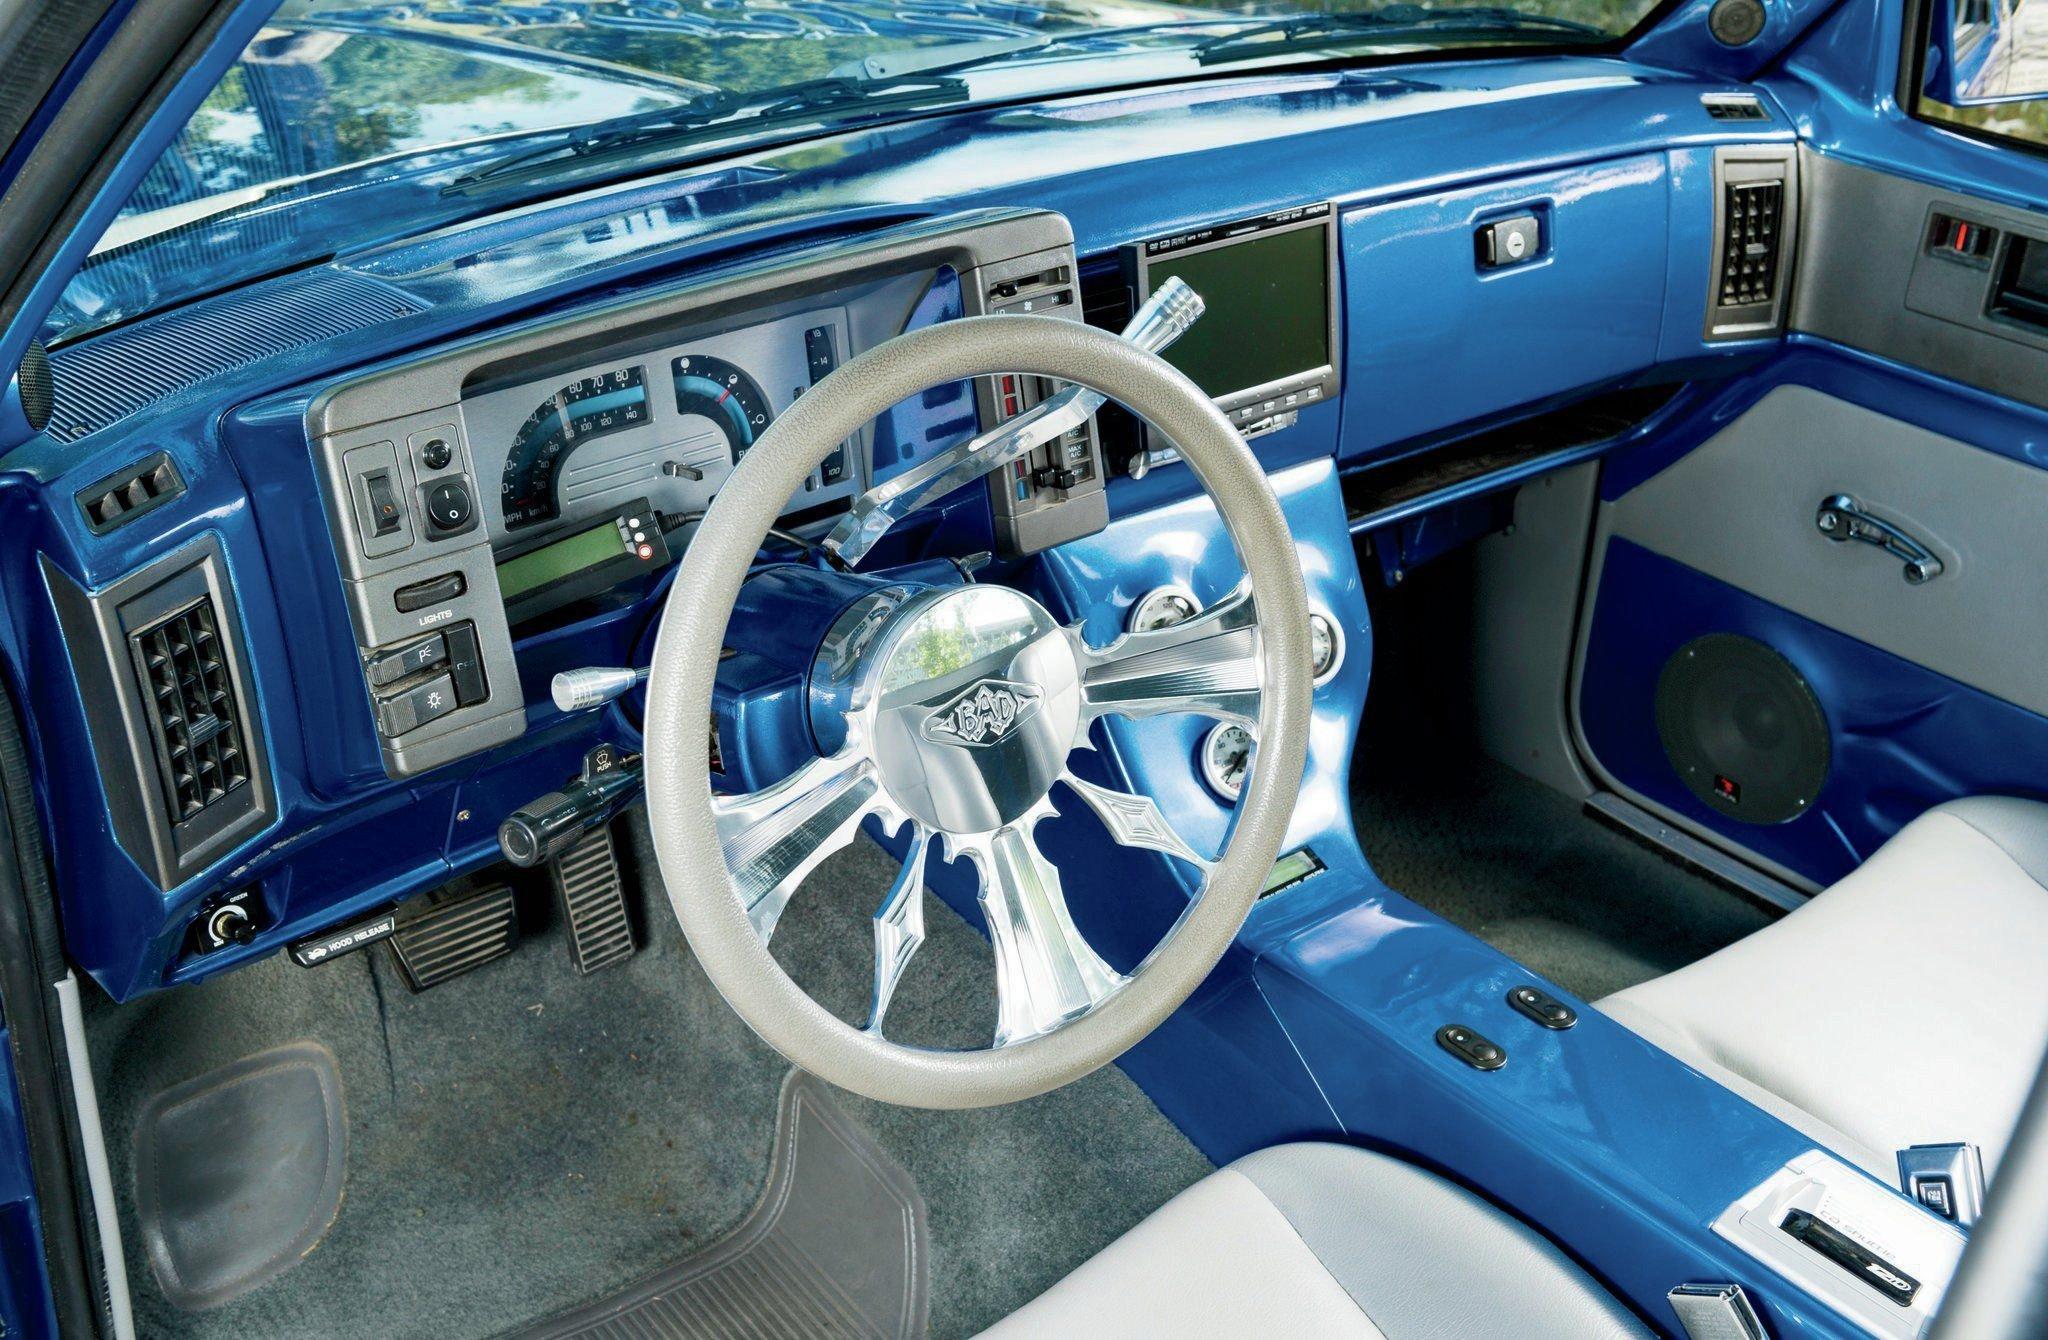 1988 Chevrolet S-10 Pickup lowrider tuning s10 custom ...